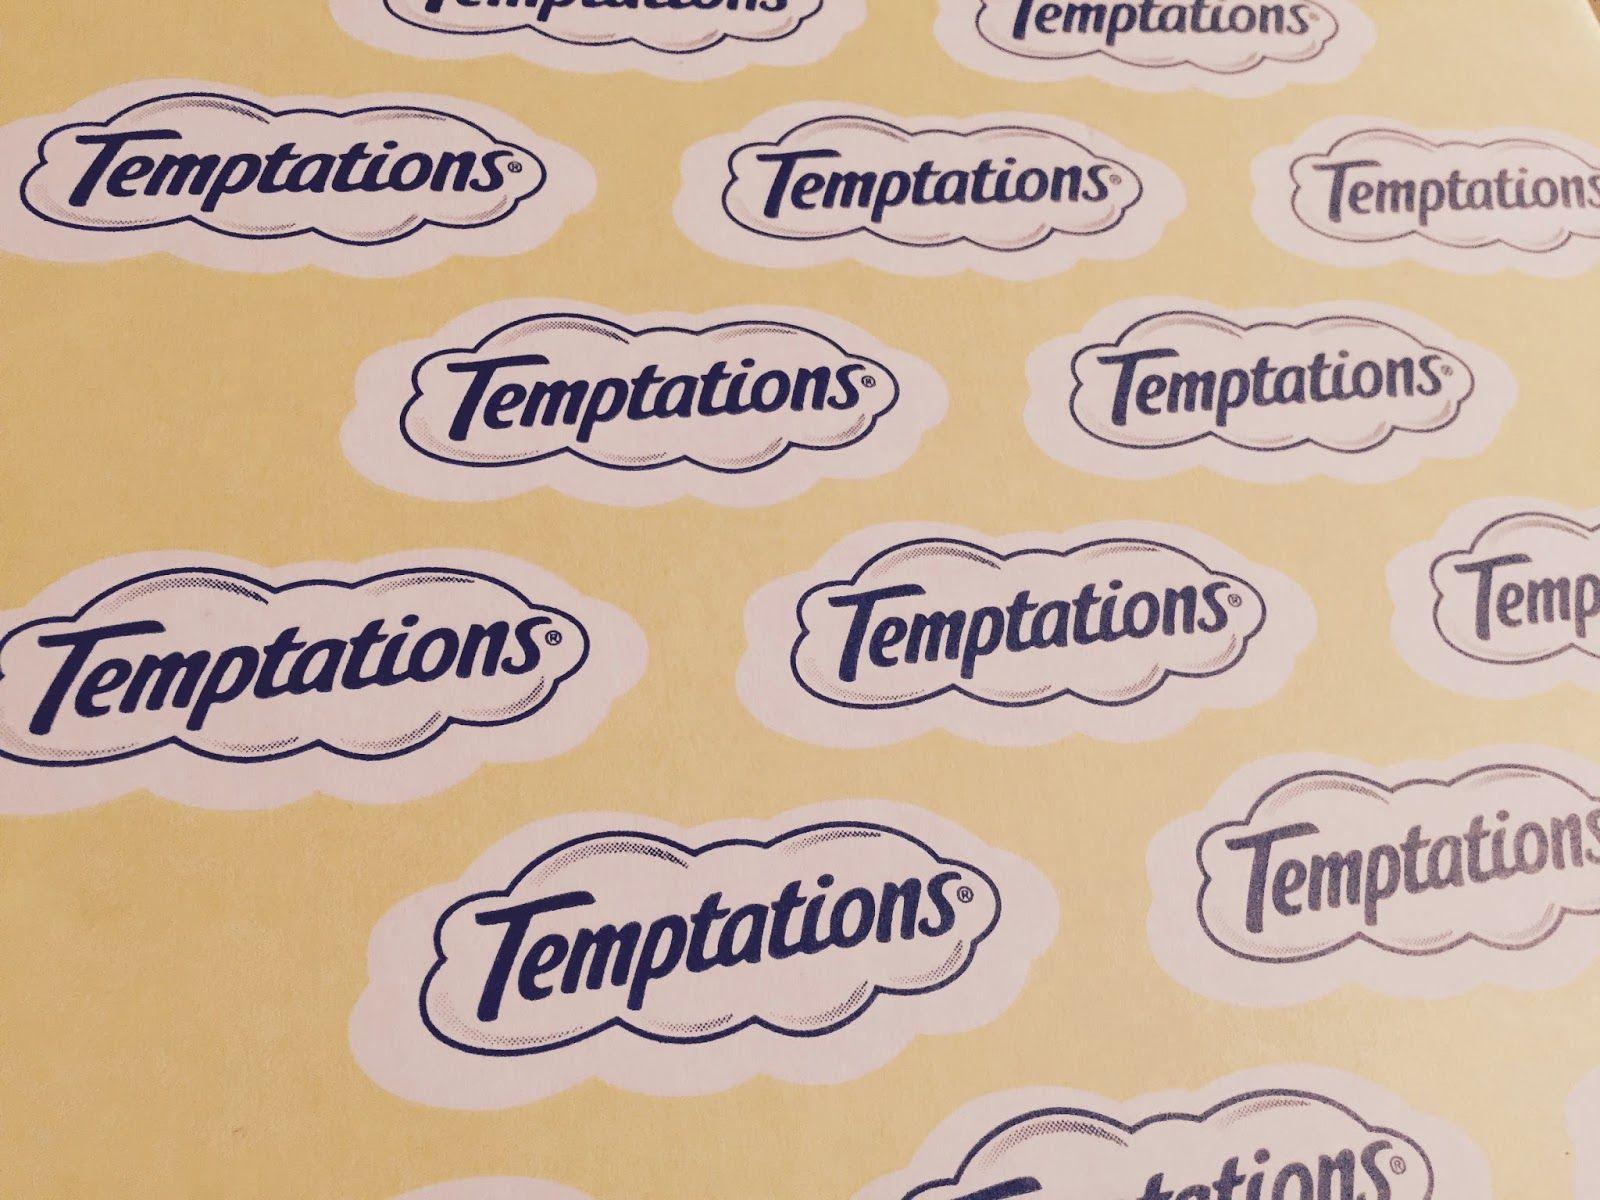 Temptations Snacky Mouse Review Temptation, Mouse, Reviews